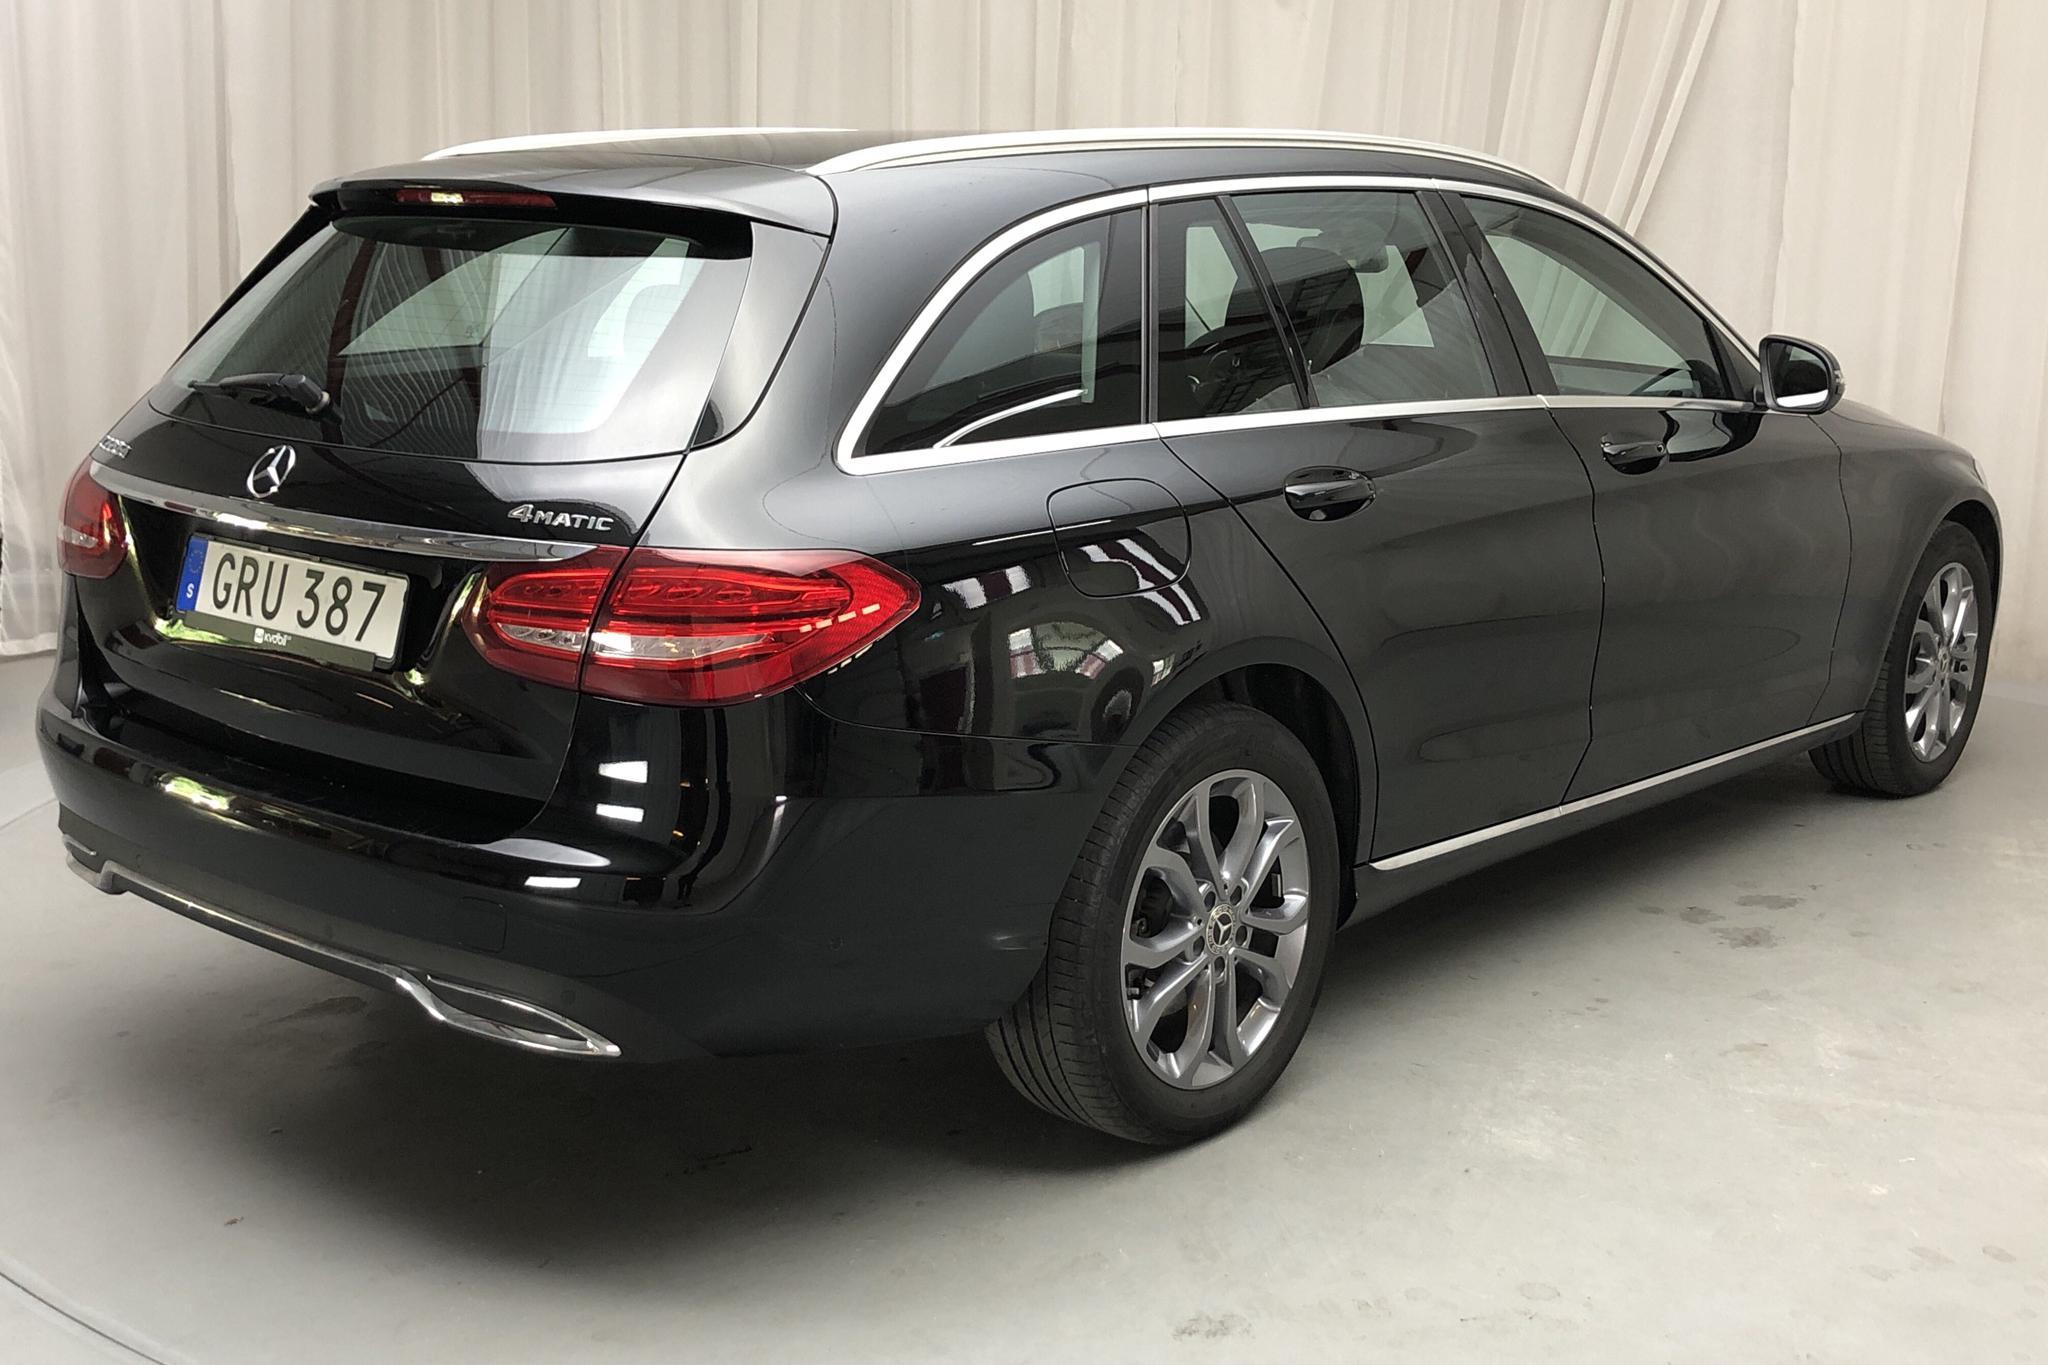 Mercedes C 220 d 4MATIC Kombi S205 (170hk) - 57 570 km - Automatic - black - 2018